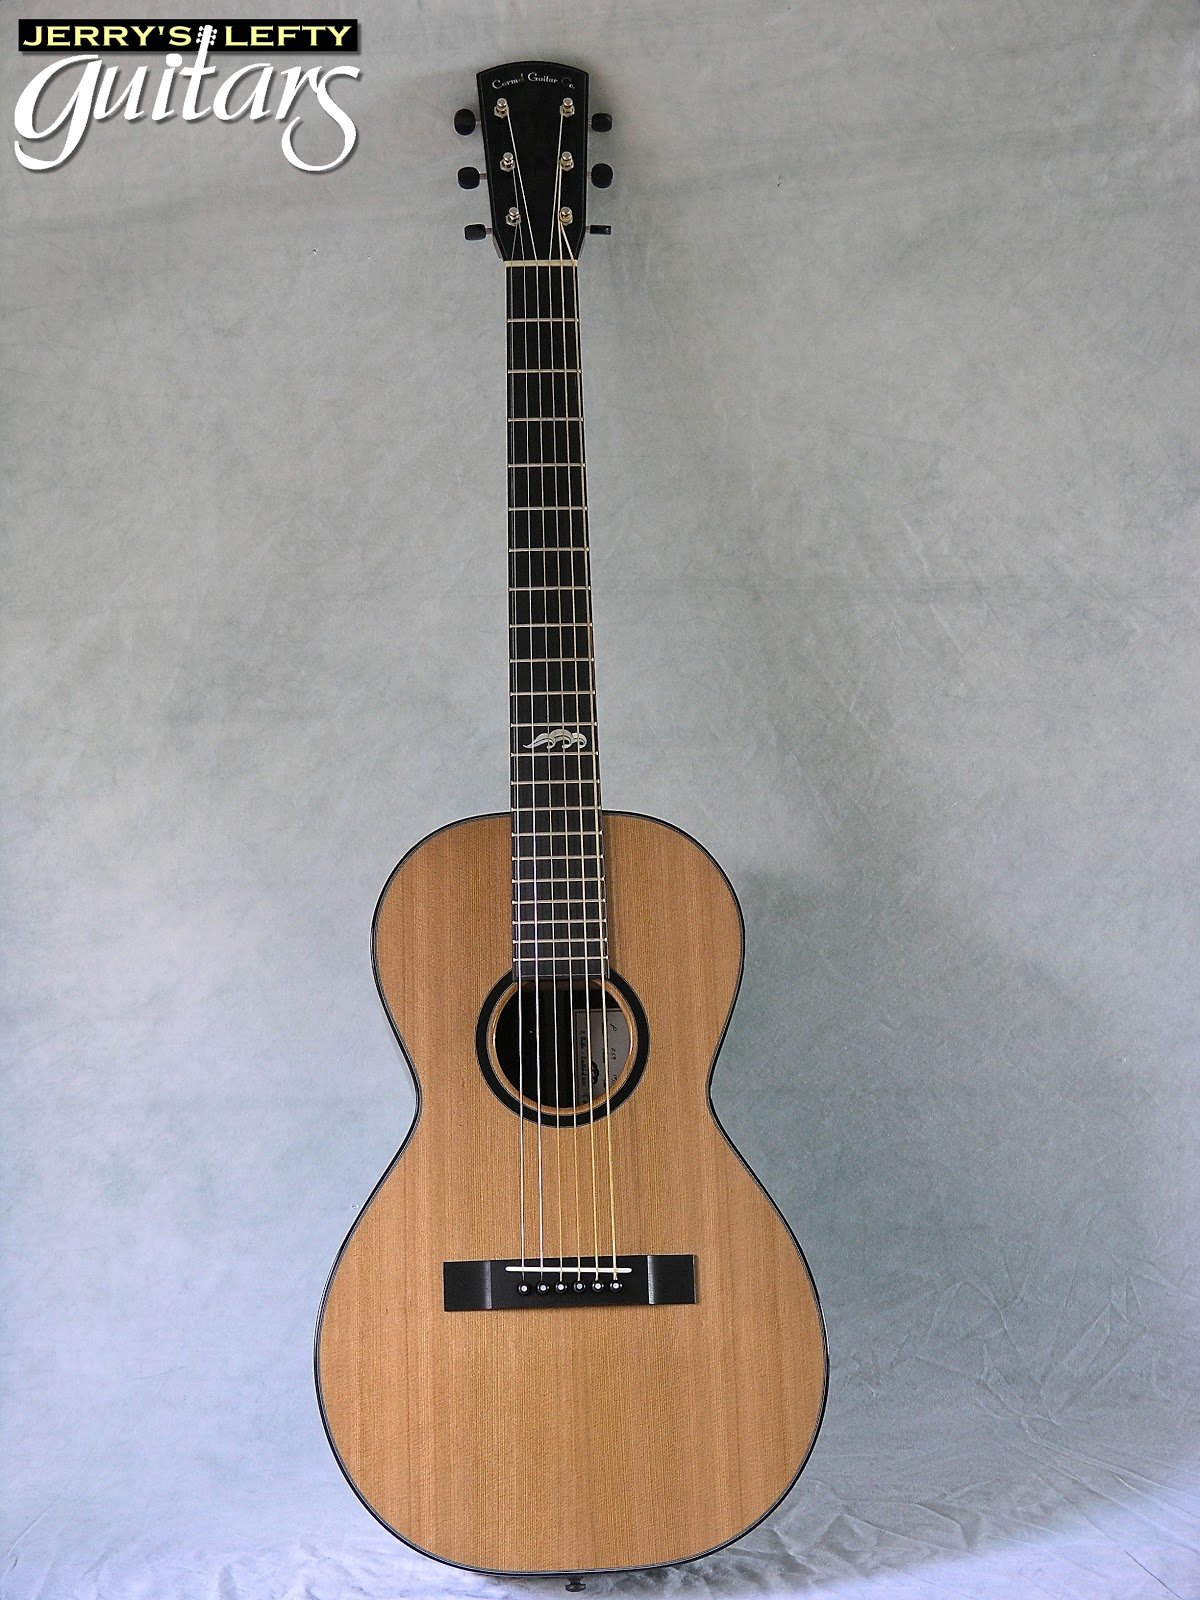 jerry 39 s lefty guitars newest guitar arrivals updated weekly carmel guitar company parlor left. Black Bedroom Furniture Sets. Home Design Ideas